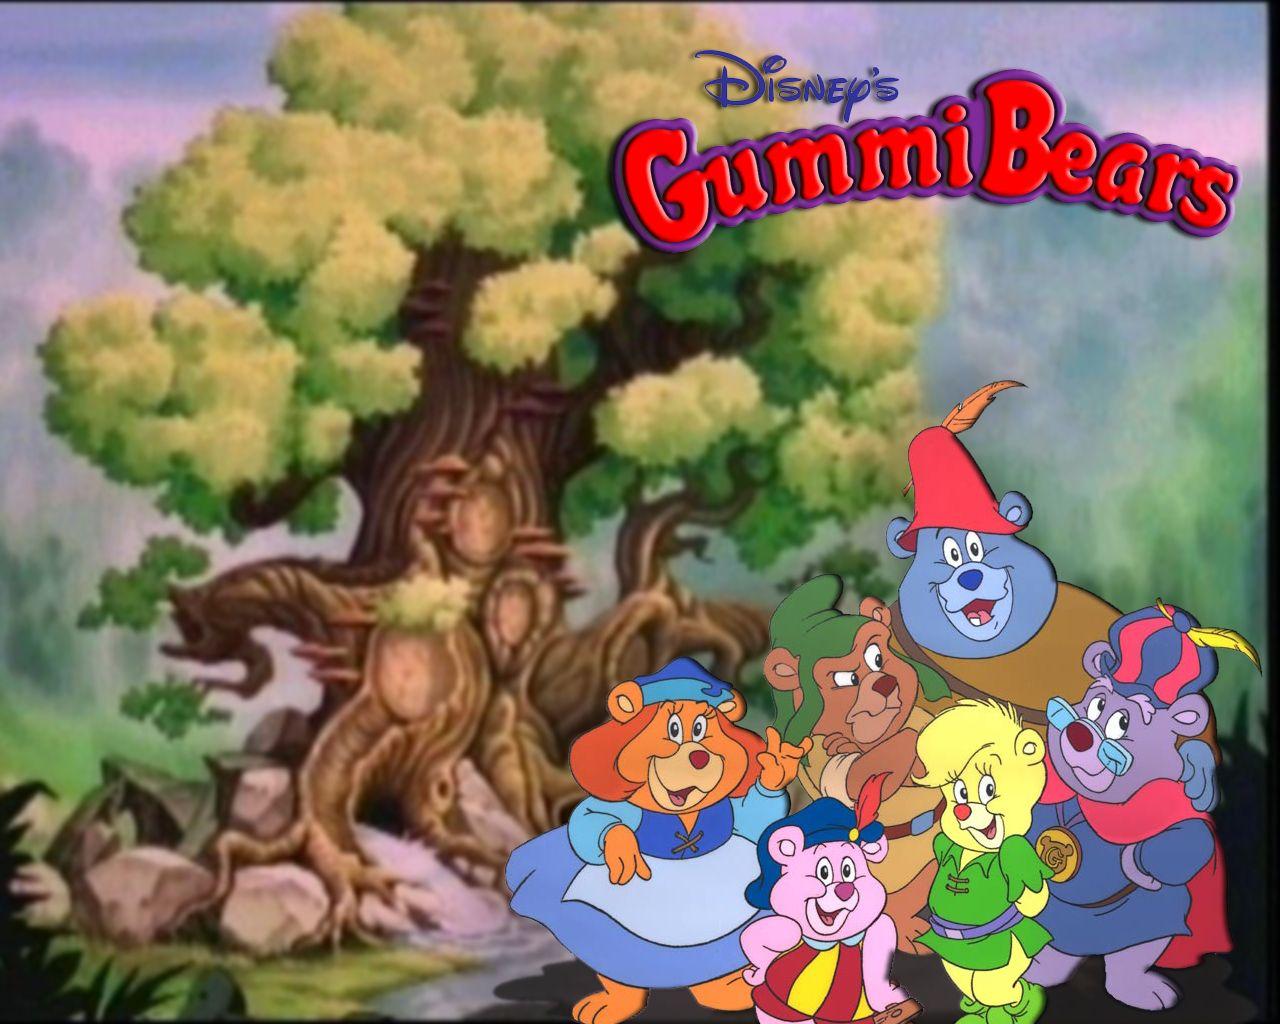 Help Me My Sis Find A Decent Disney Gummi Bears Wallpaper